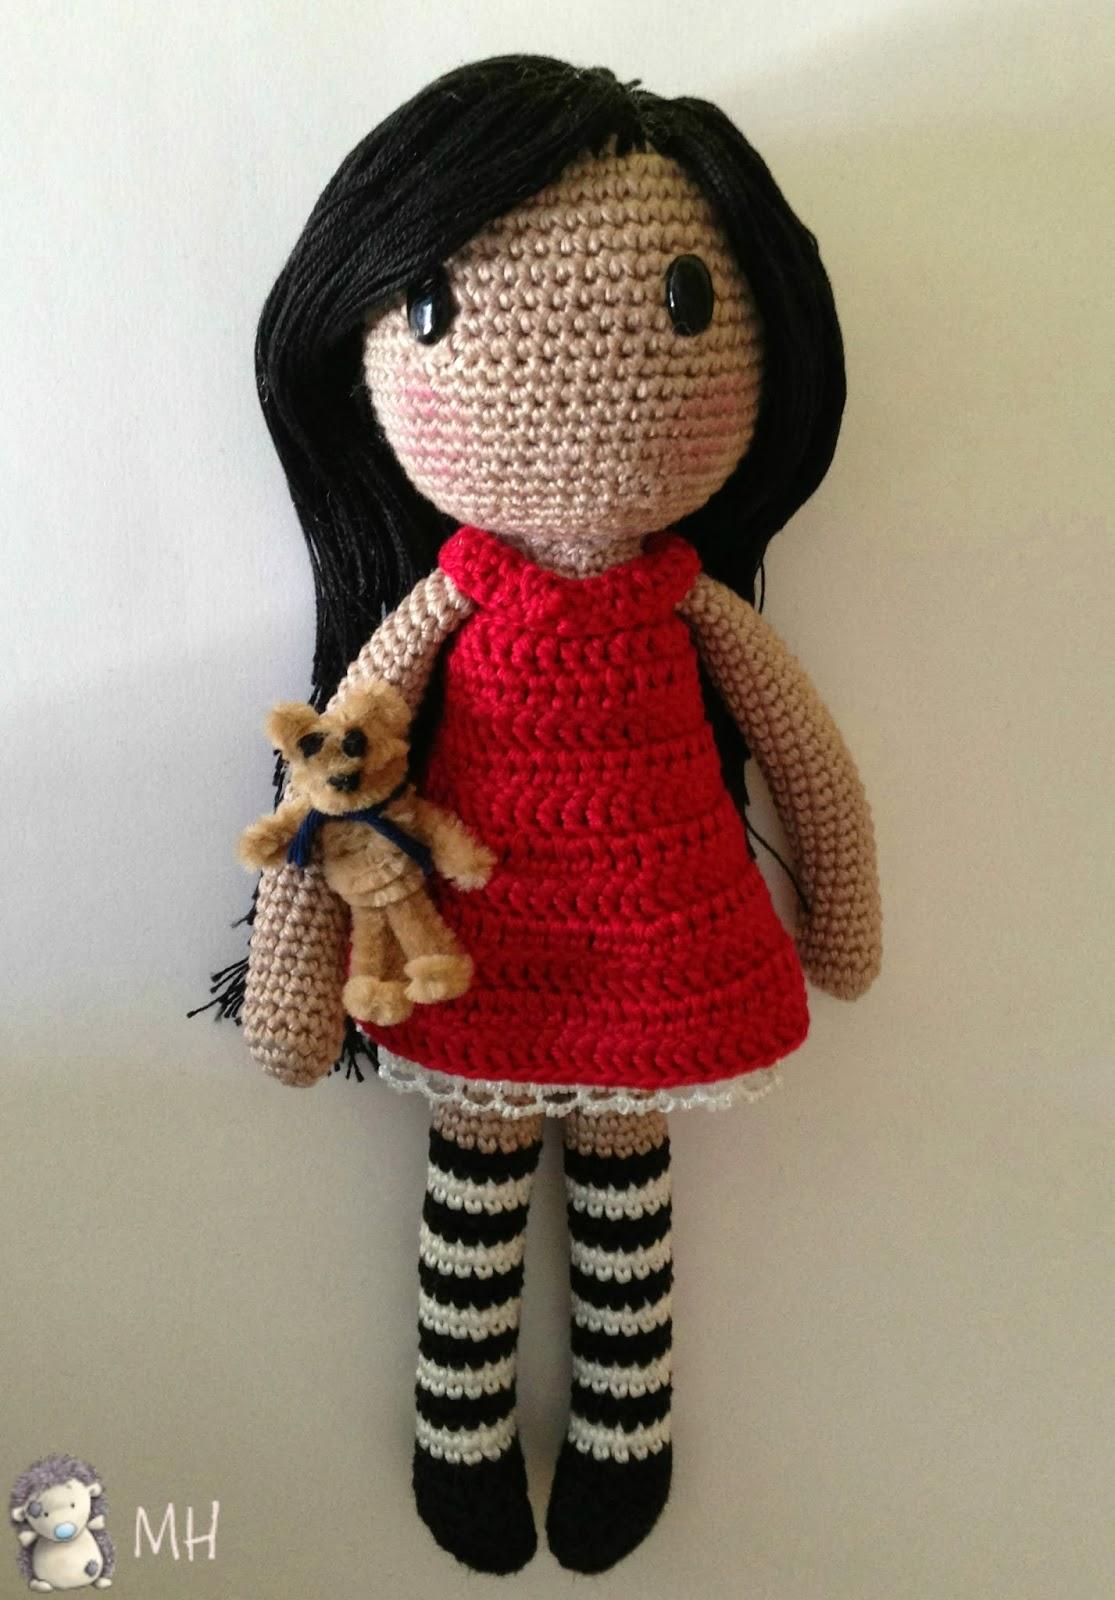 Knitting Patterns Doctor Who Dolls : MADRES HIPERACTIVAS: Gorjuss Amigurumi, Patron Gratis